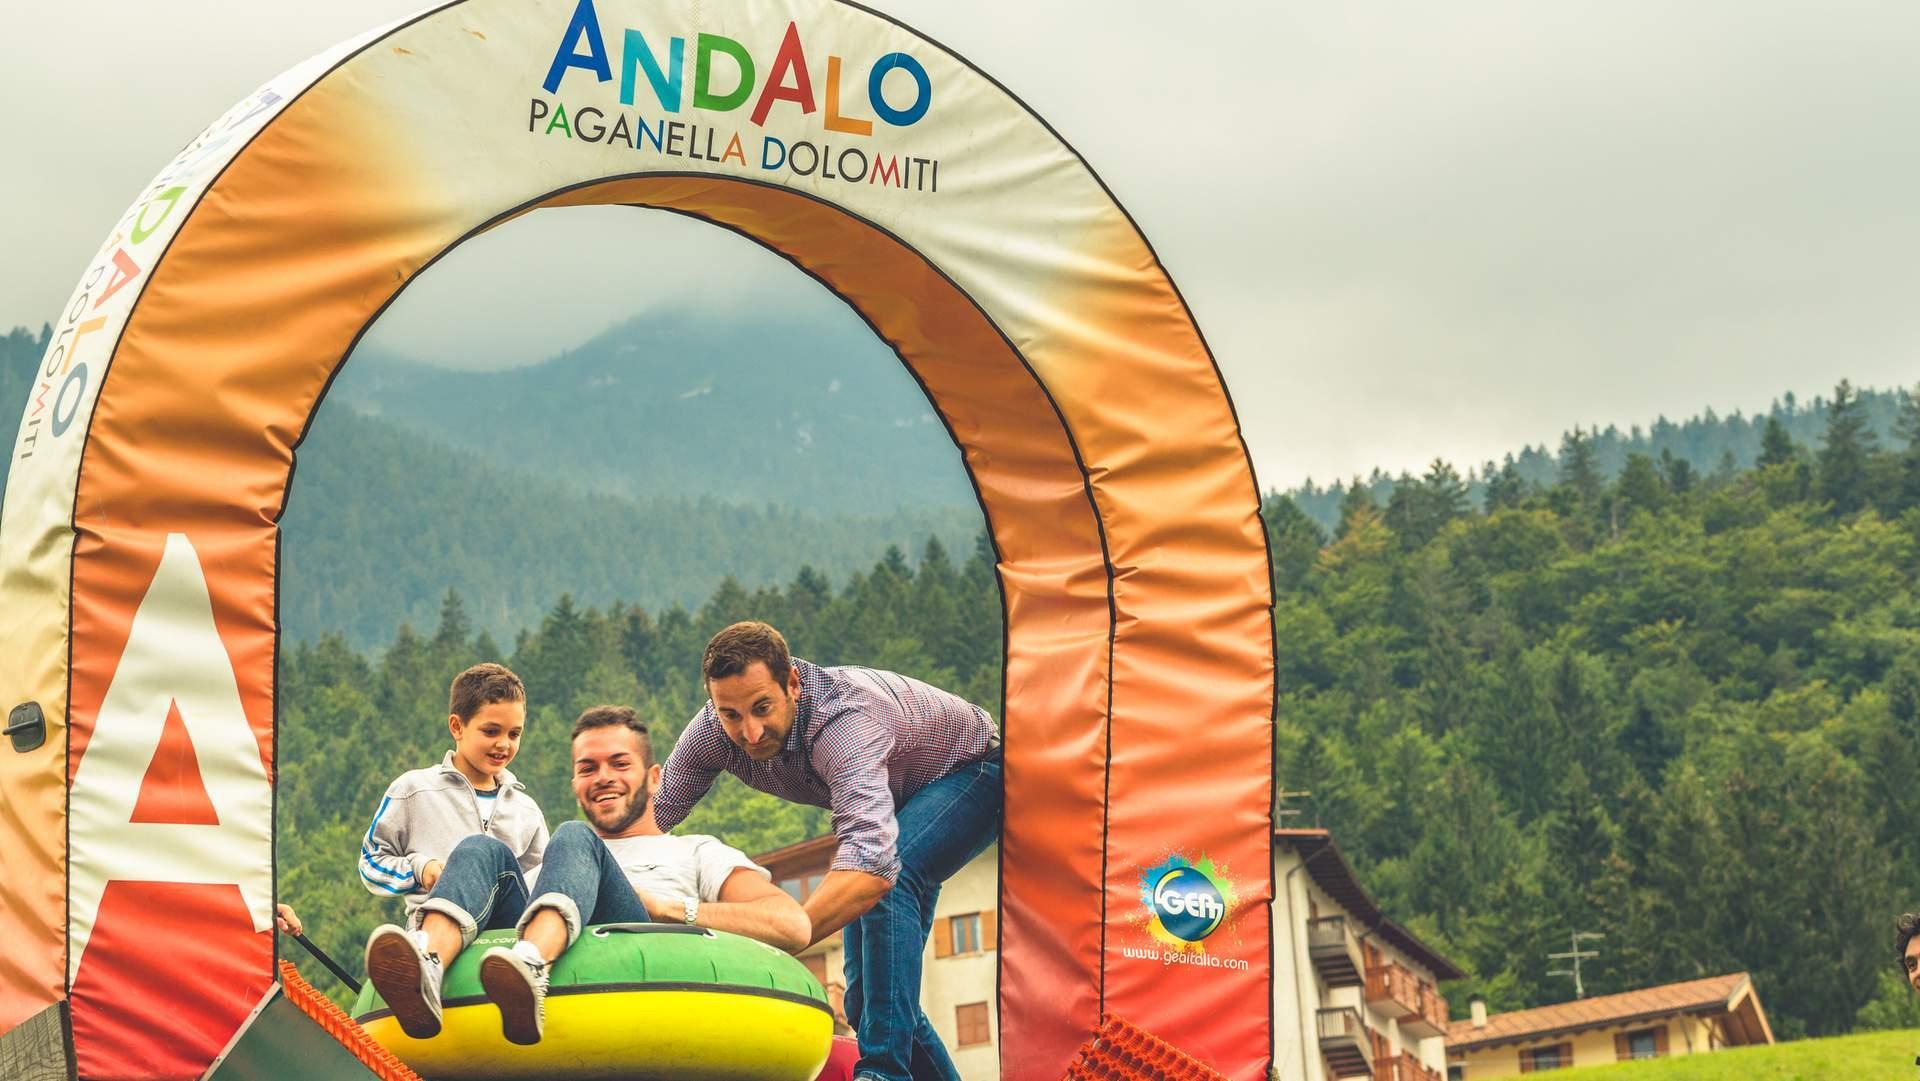 Andalo Life Park